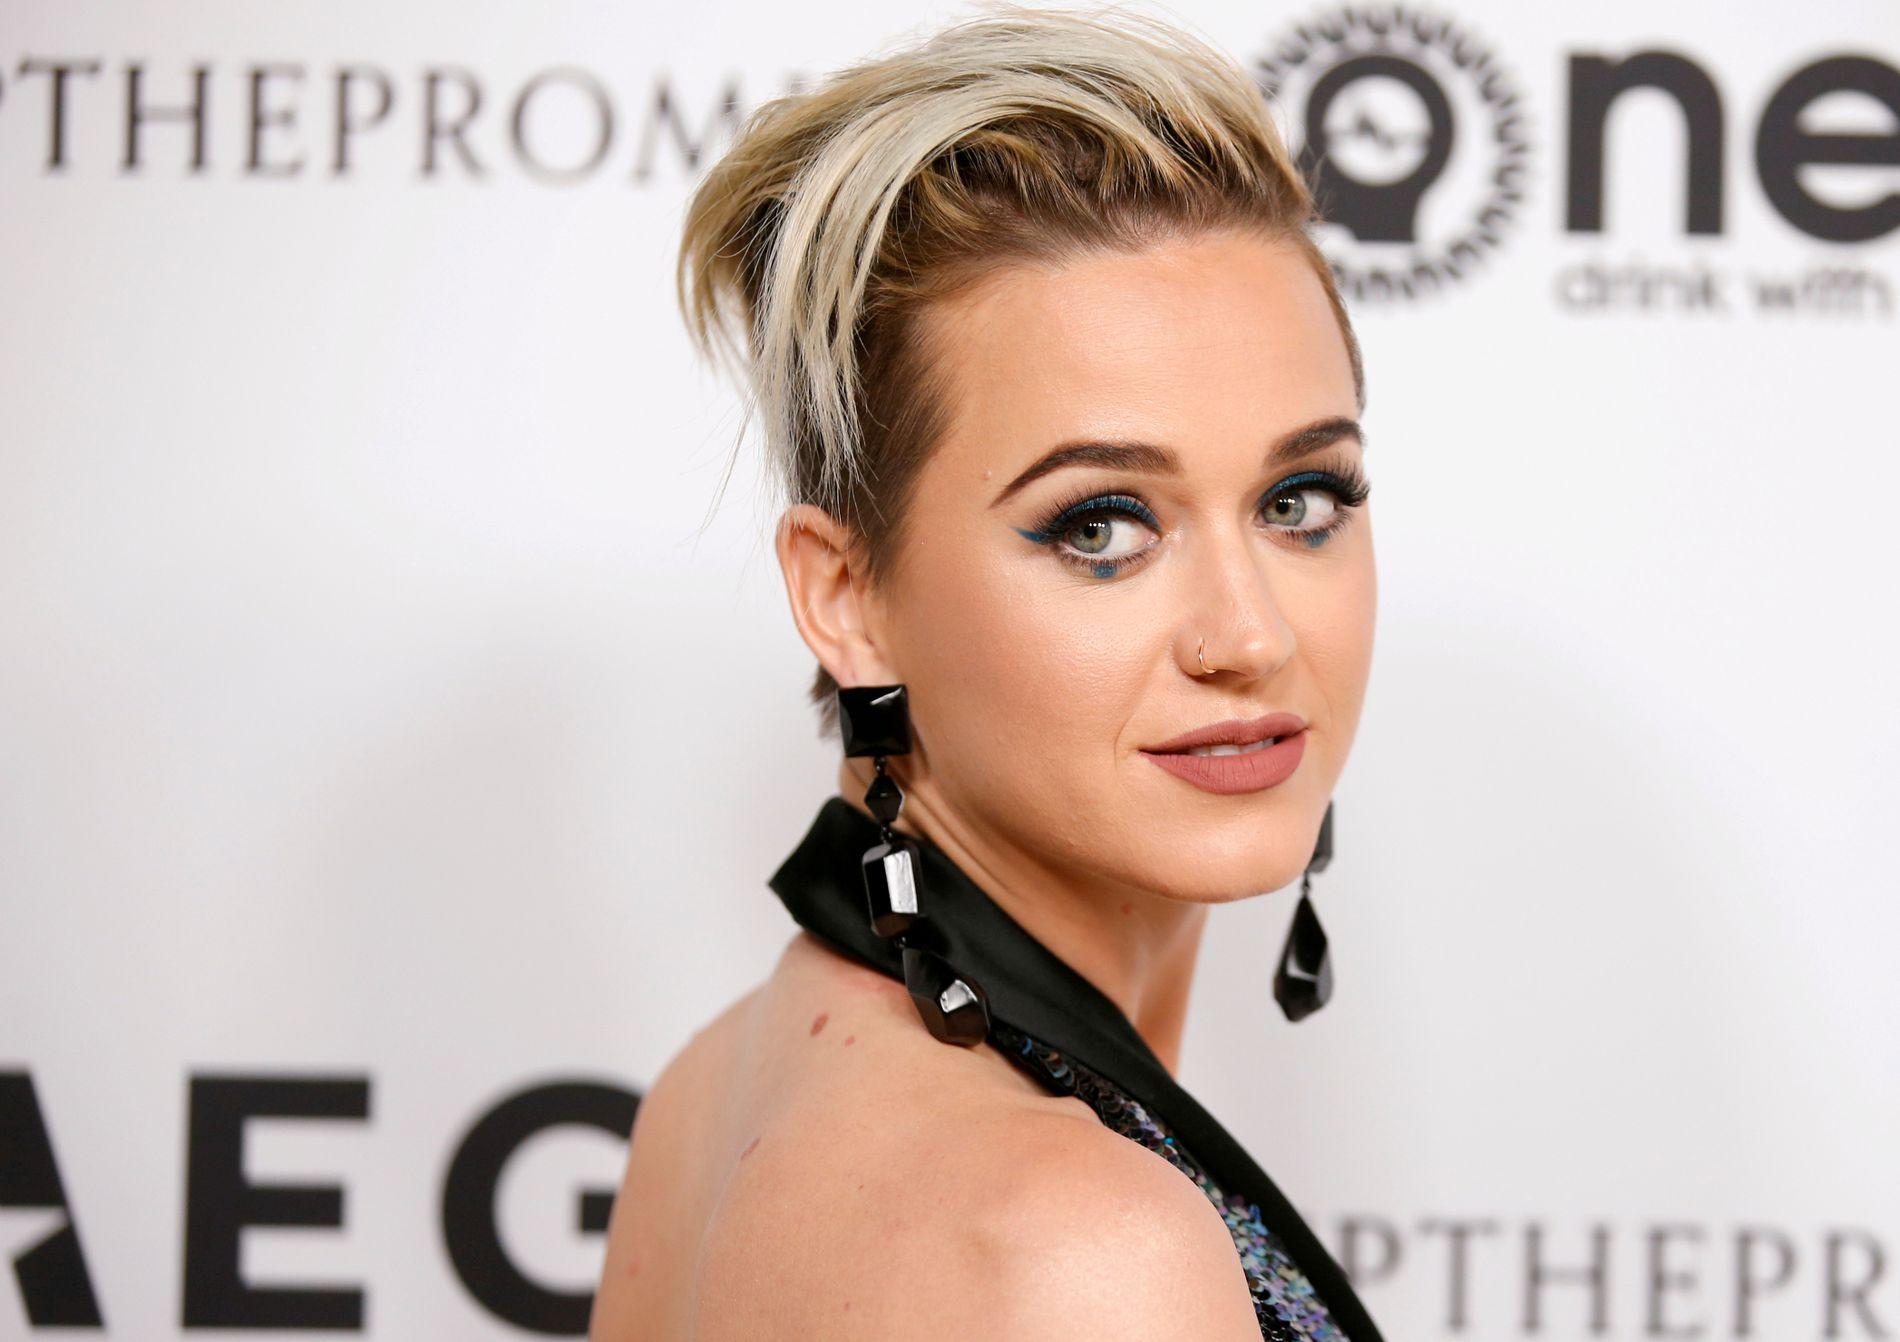 FREIDIG: Katy Perry, her på en veldedighetsgalla i Los Angeles i fjor.